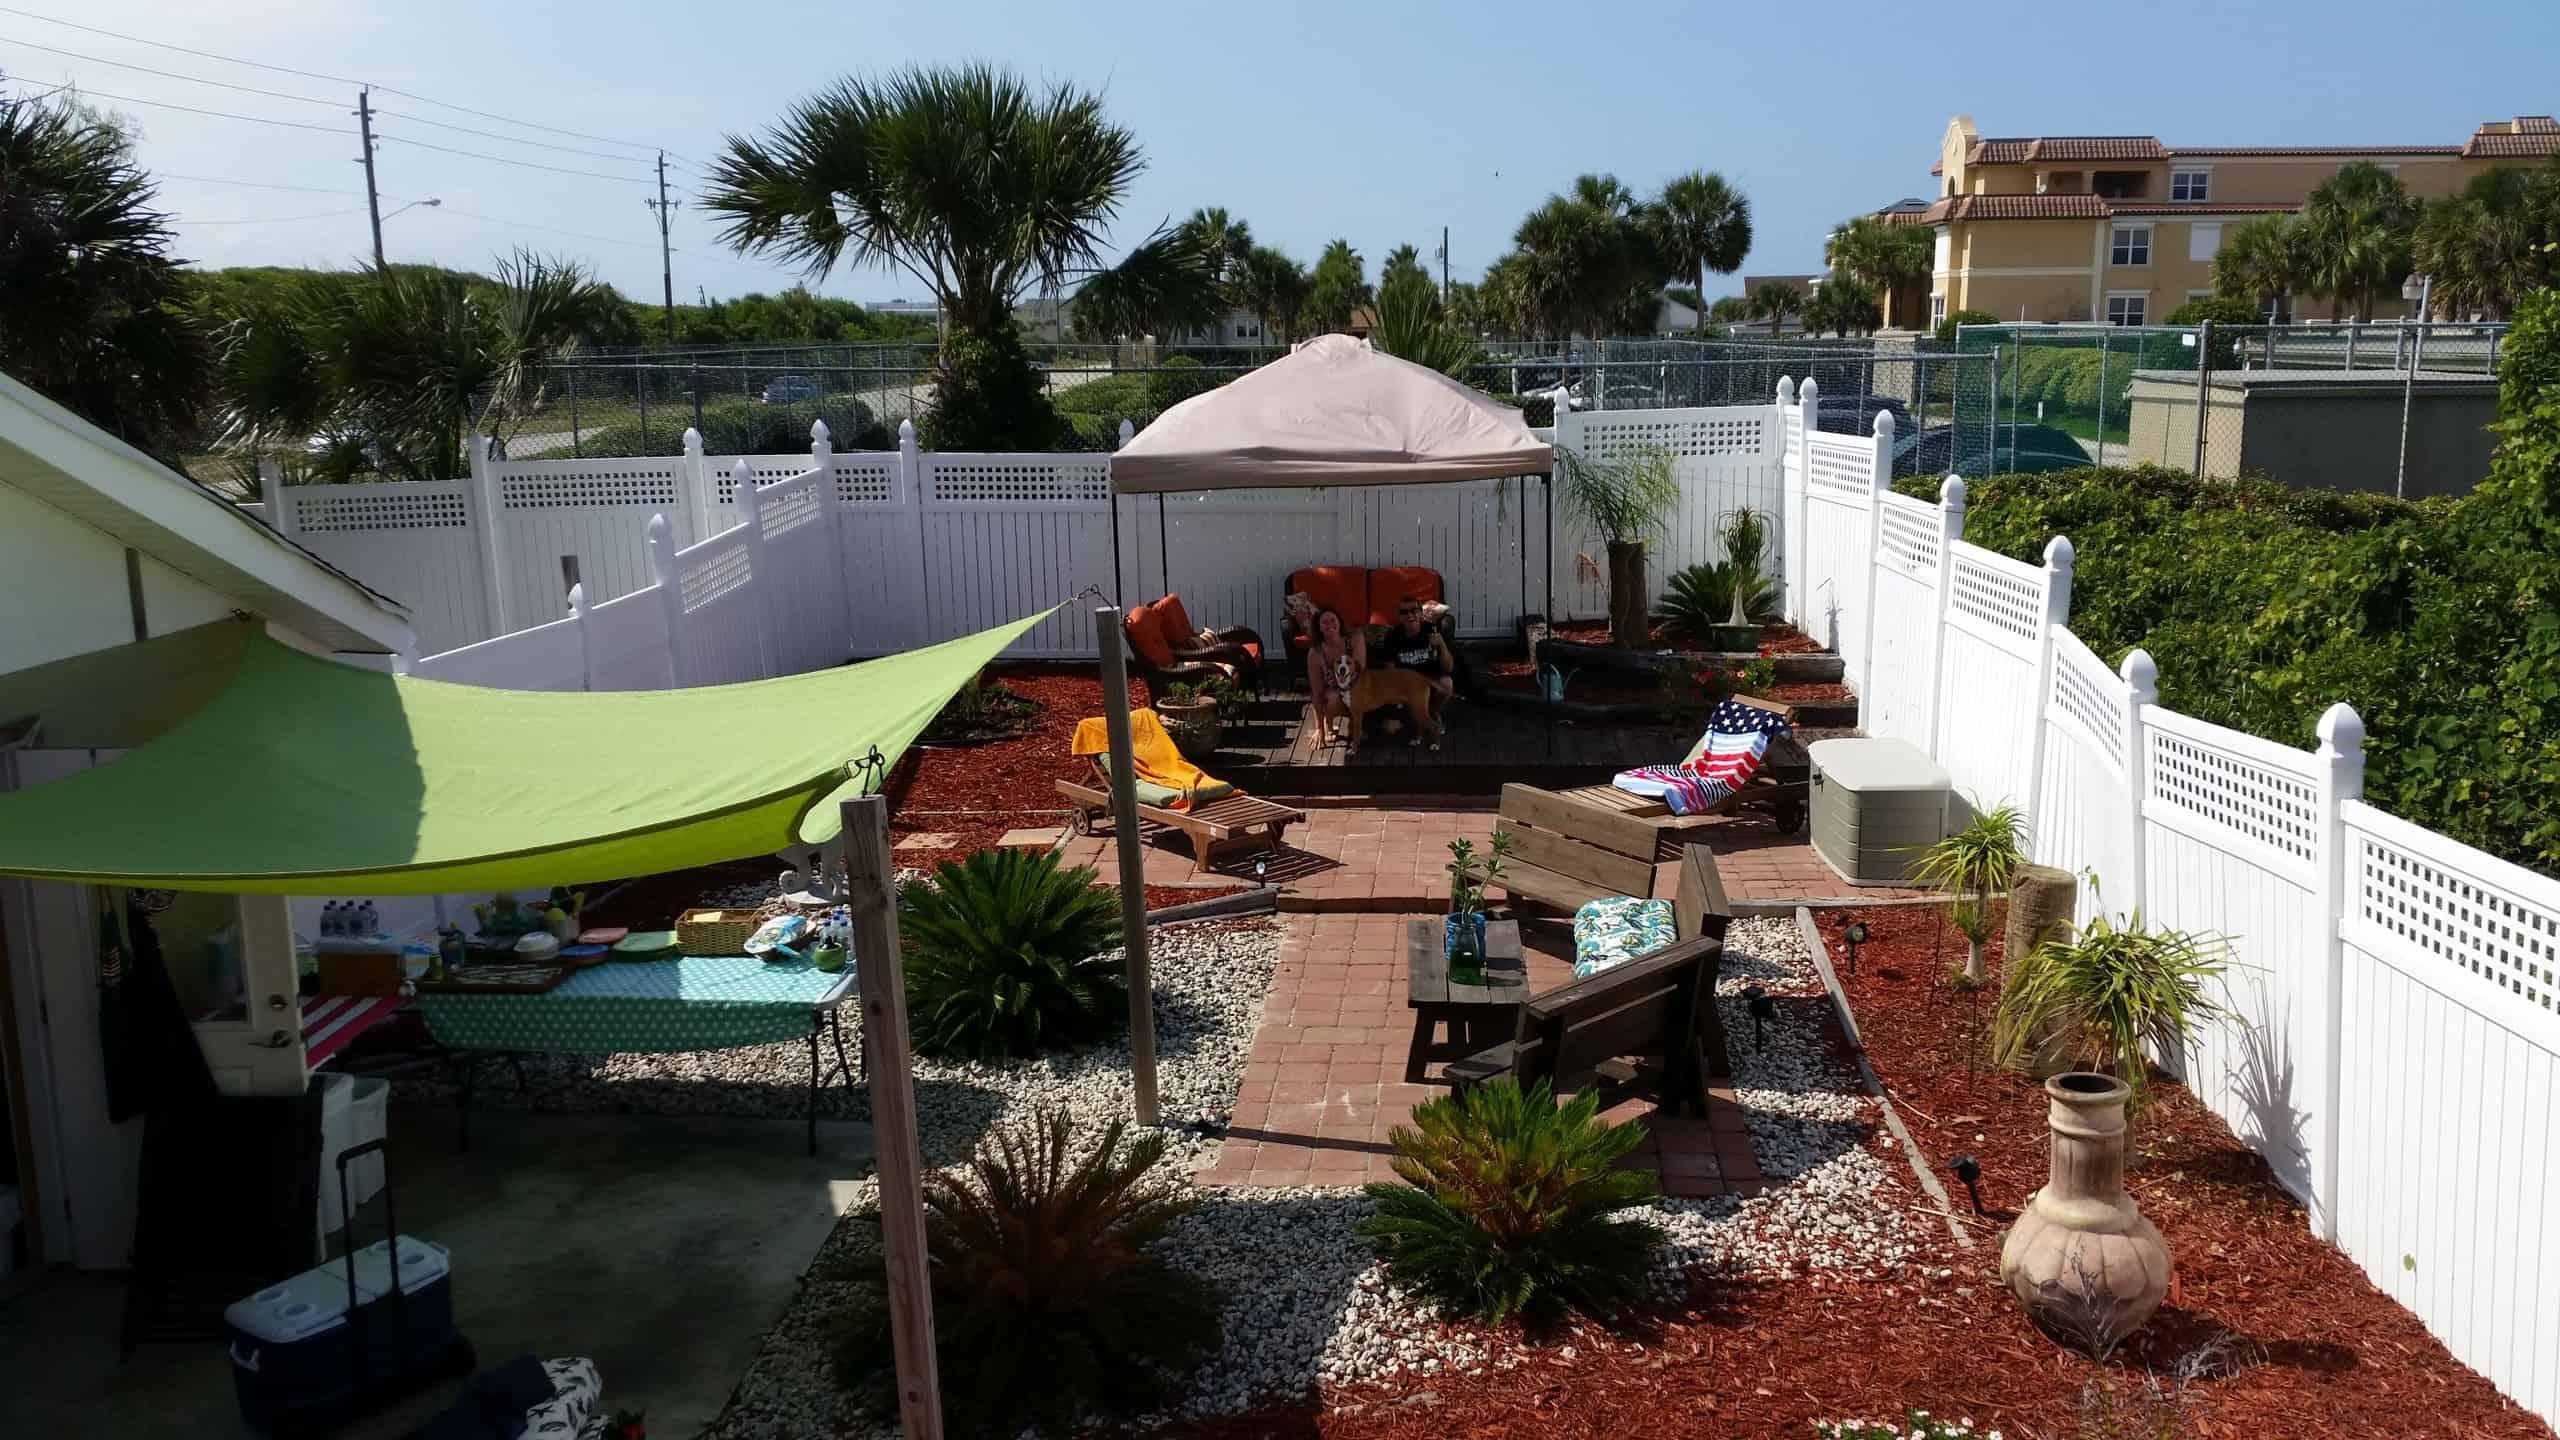 Image of Airbnb rental in St Augustine